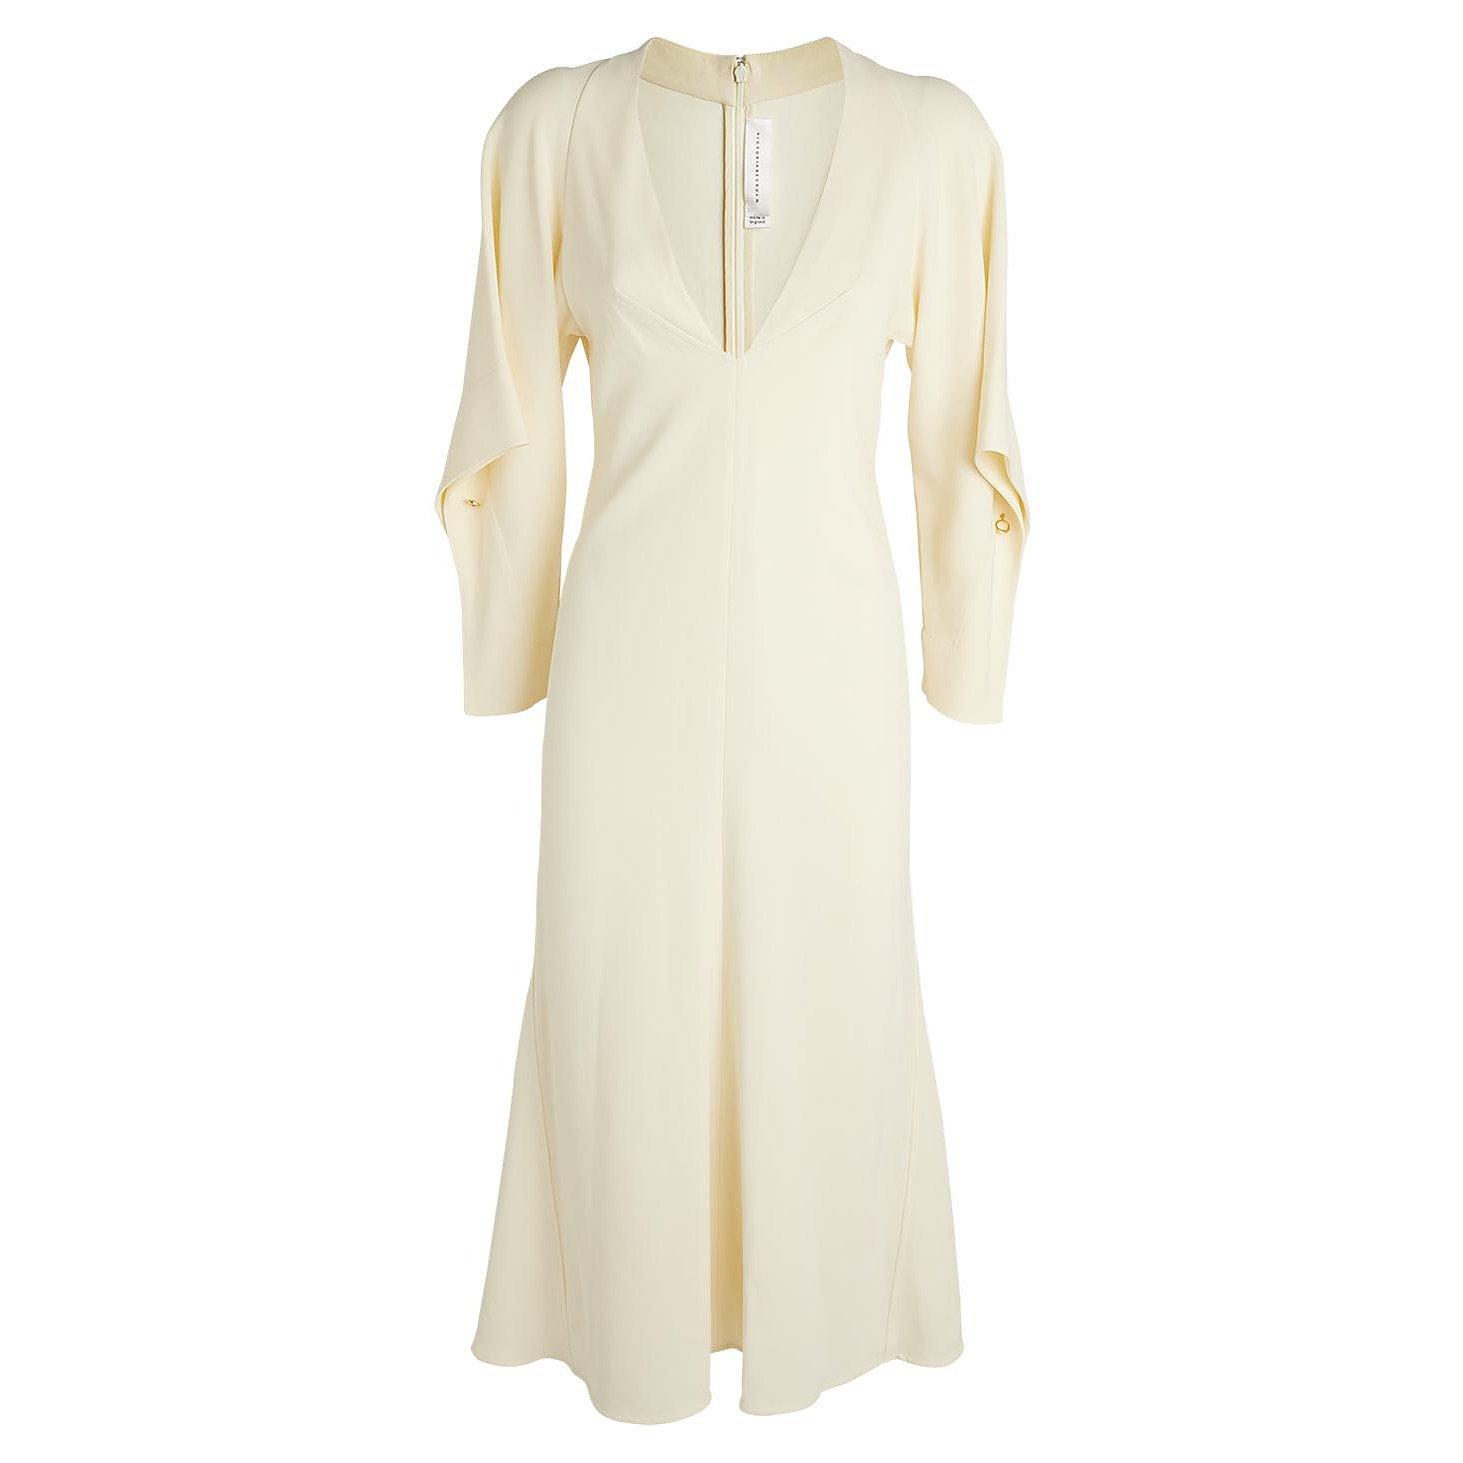 Victoria Beckham Draped Sleeve V-Neck Dress